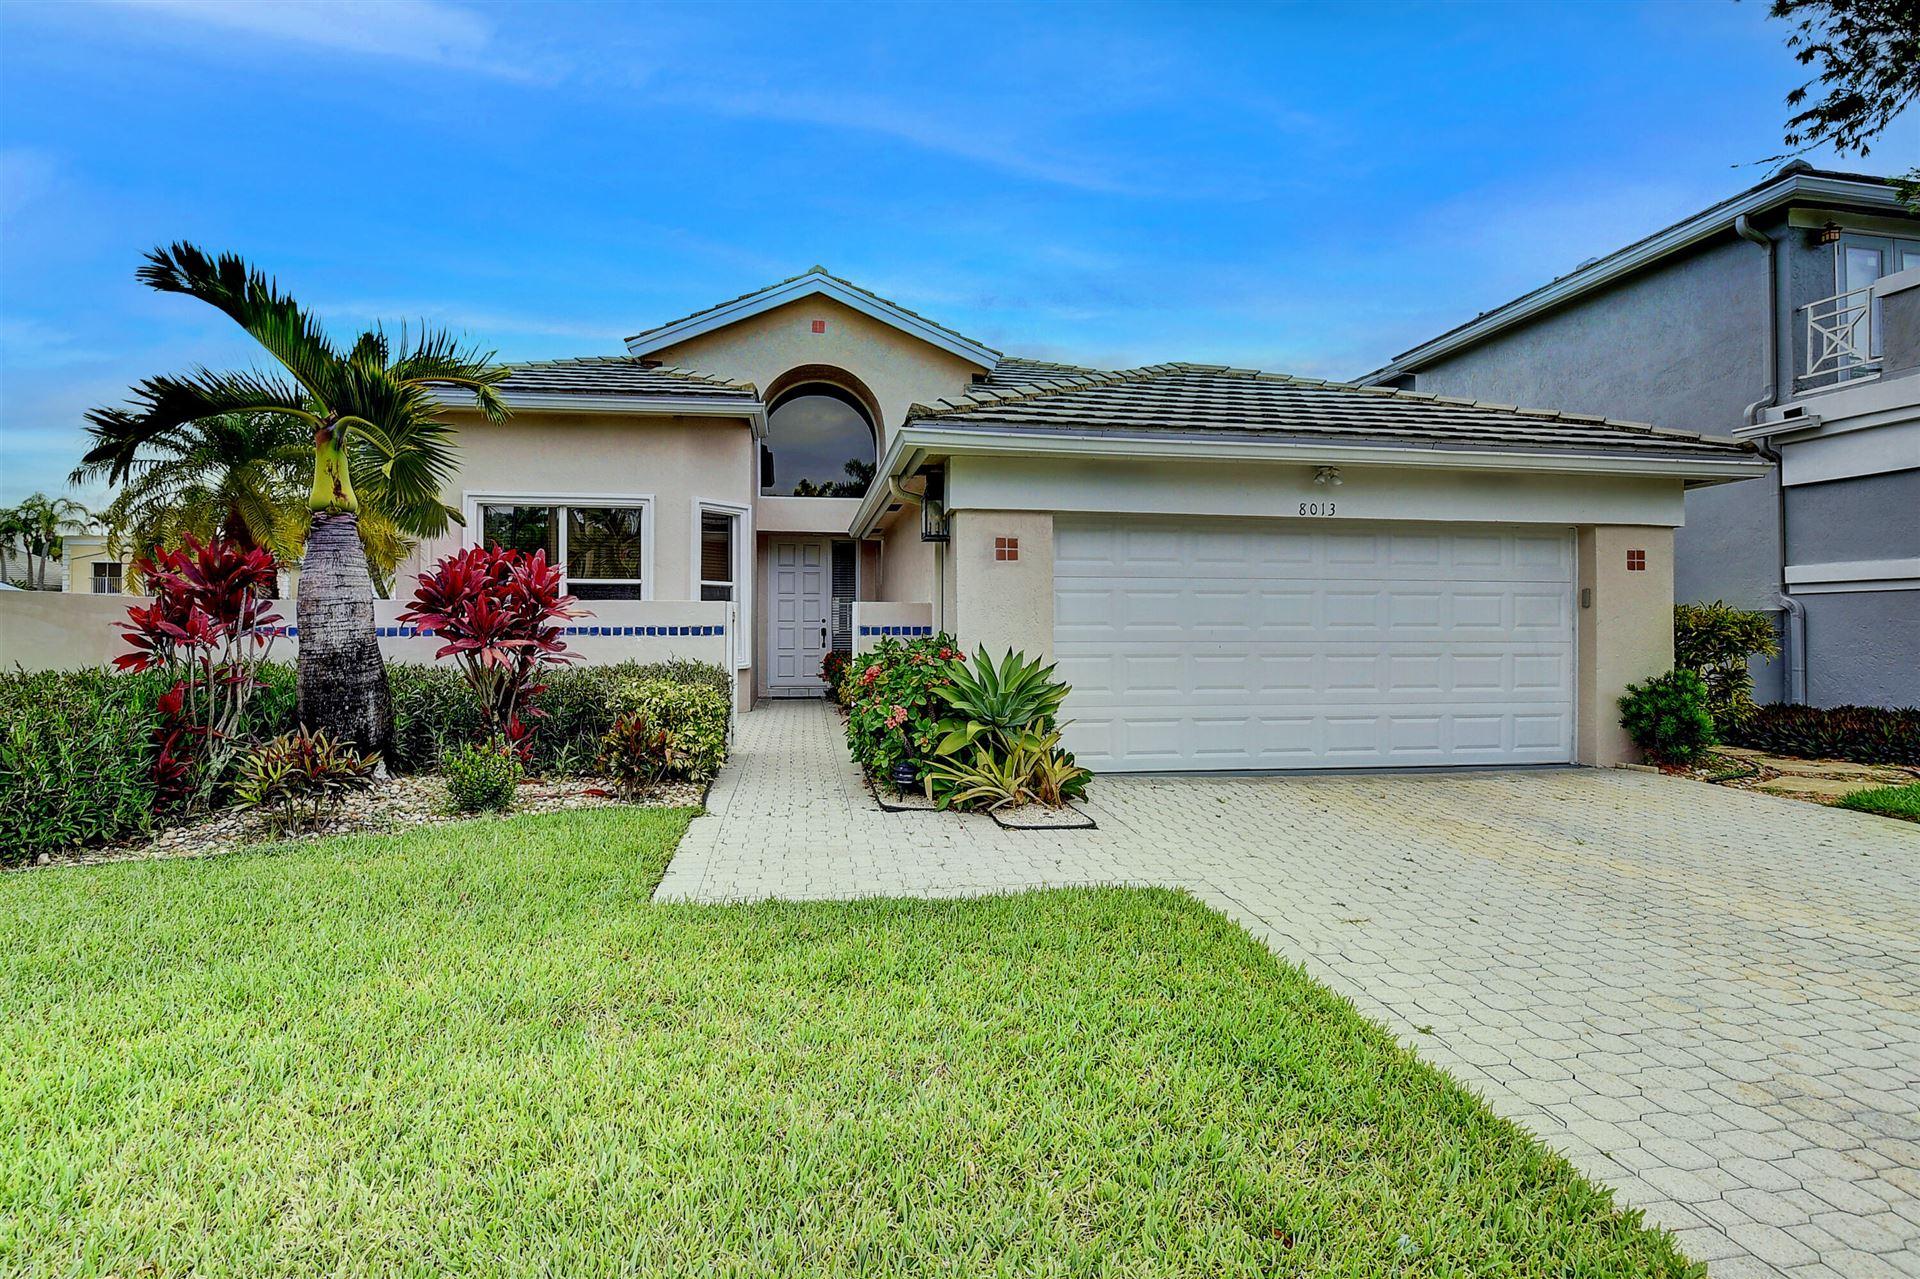 8013 Travelers Tree Drive, Boca Raton, FL 33433 - #: RX-10723653